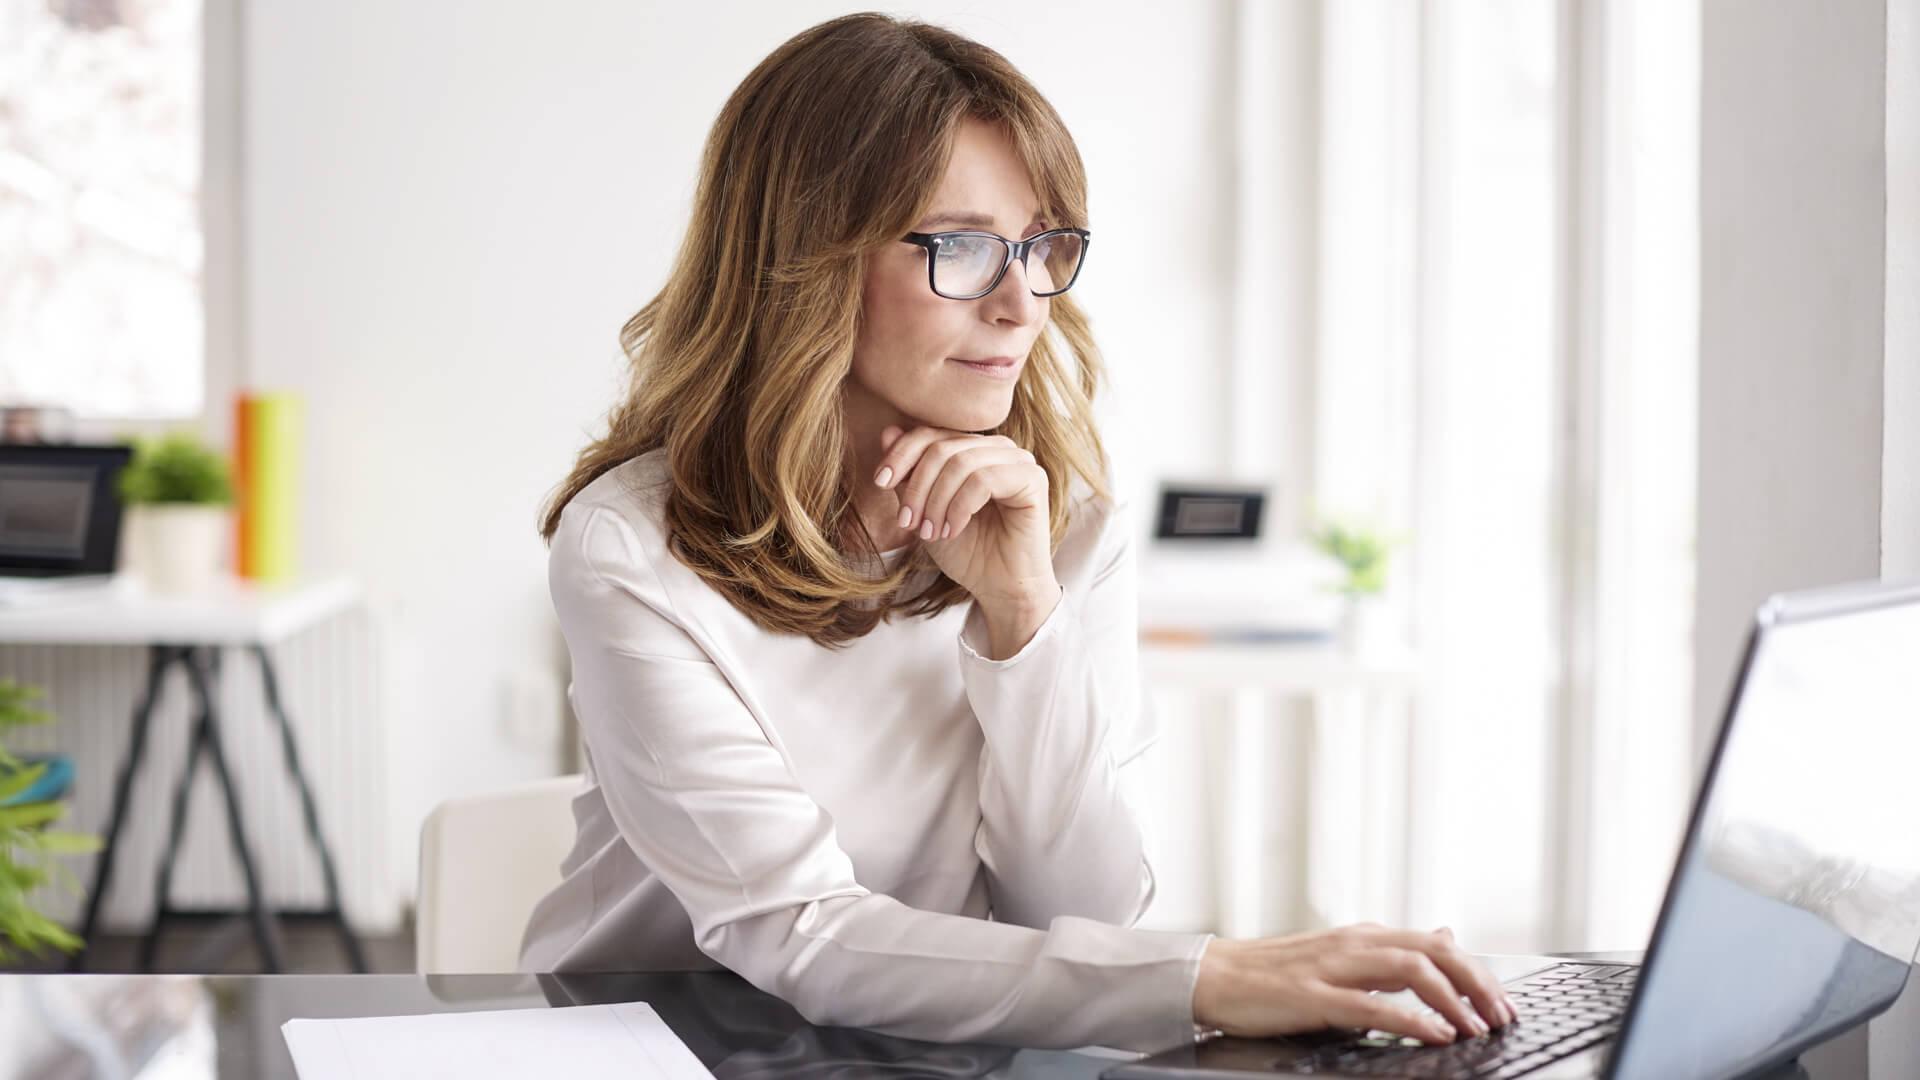 woman buying bonds online